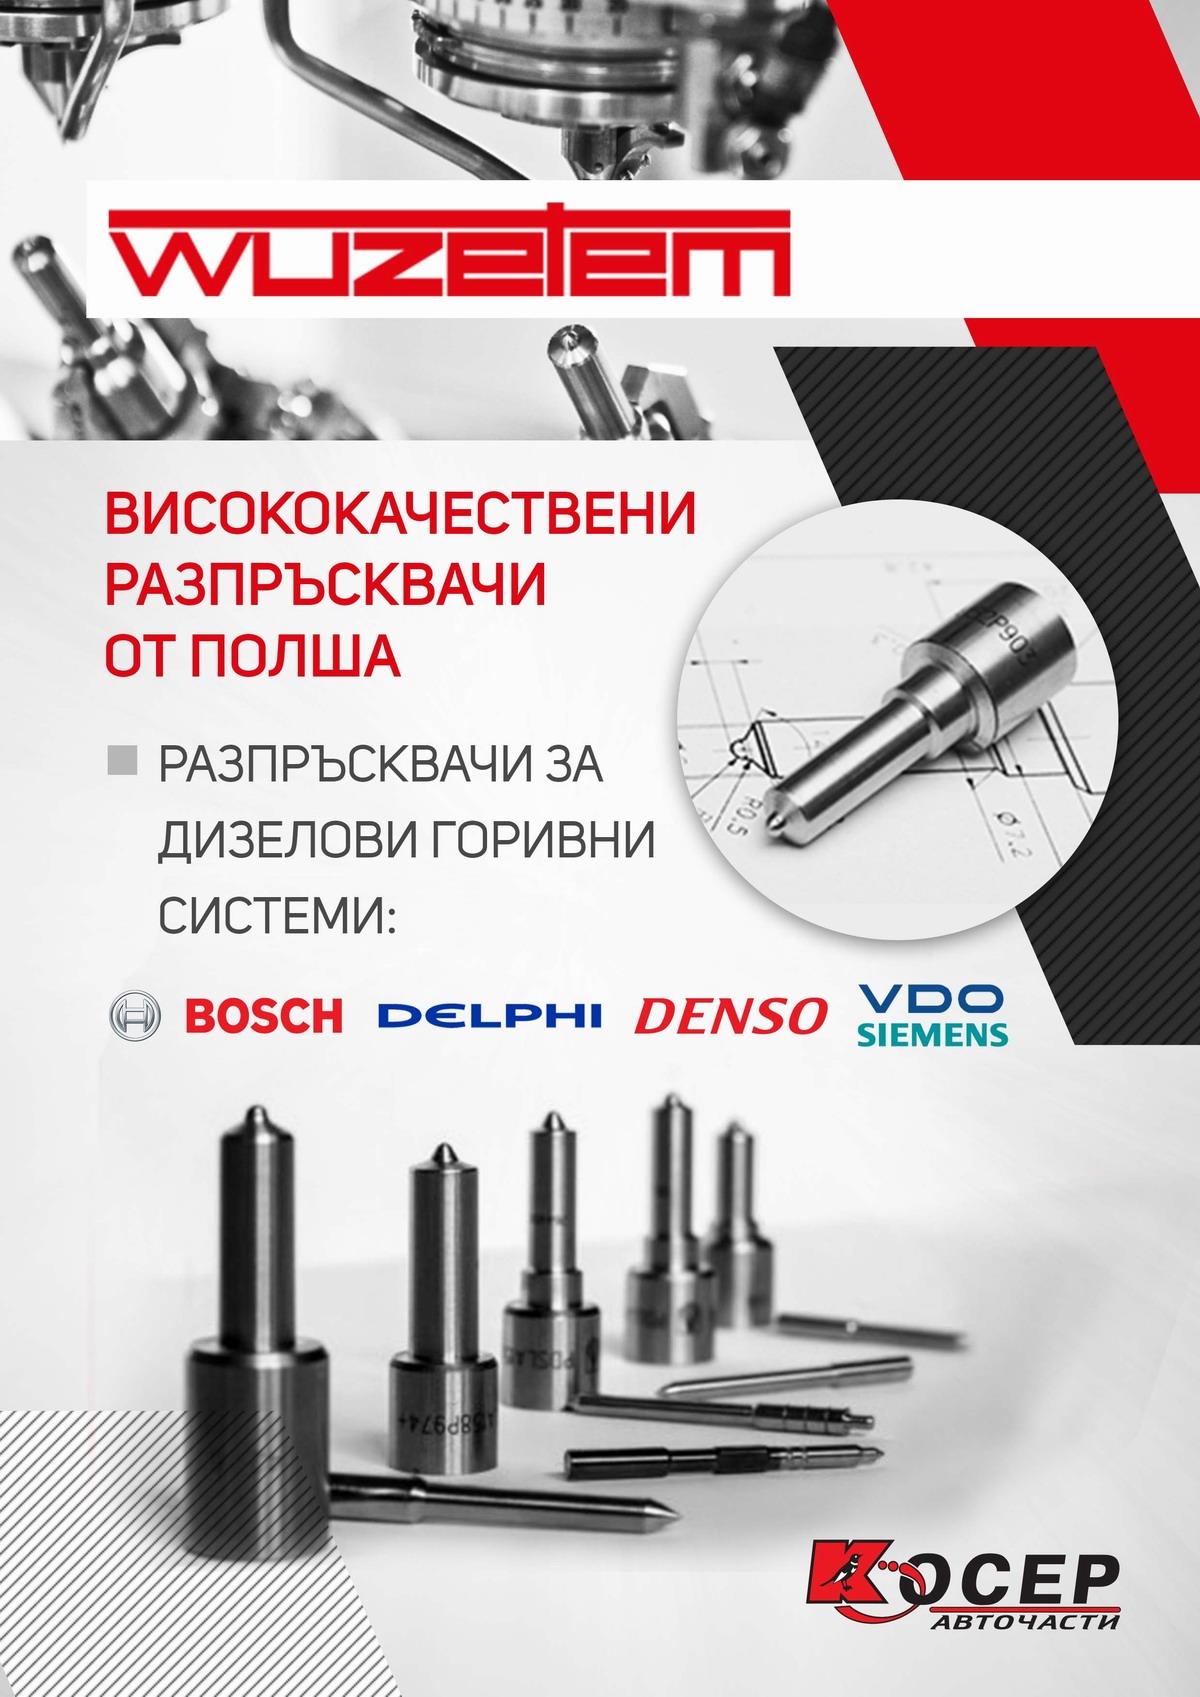 WUZETEM - дизелови разпръсквачи